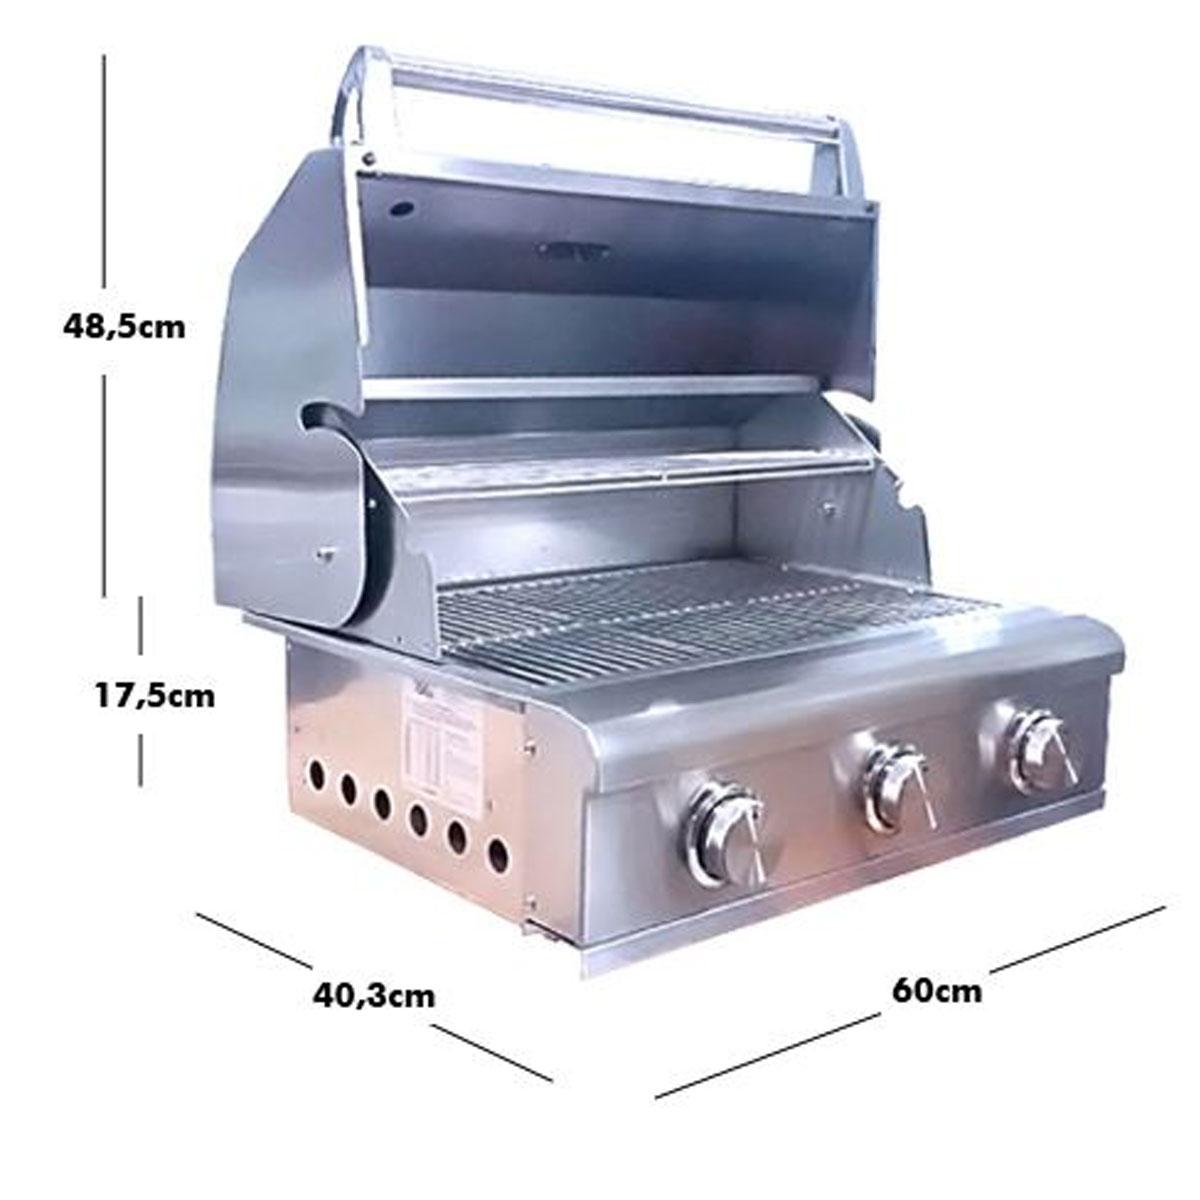 Churrasqueira a Gás 3 Queimadores Home&Grill Smart  - Sua Casa Gourmet e Cia